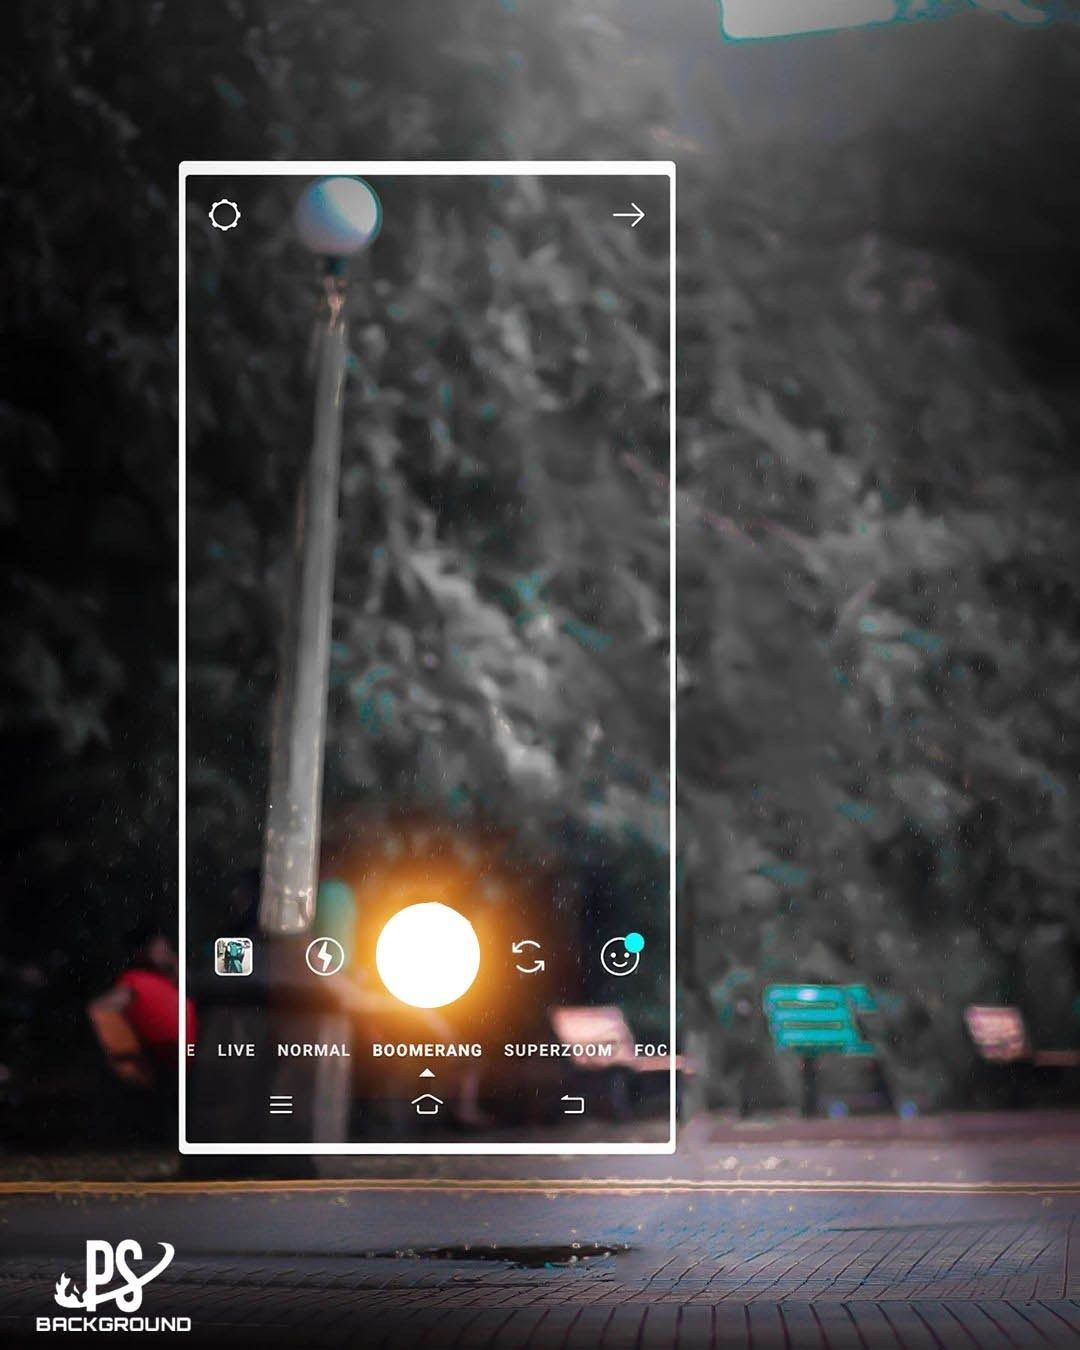 New Atharv Raut Background Dslr Background Images Black